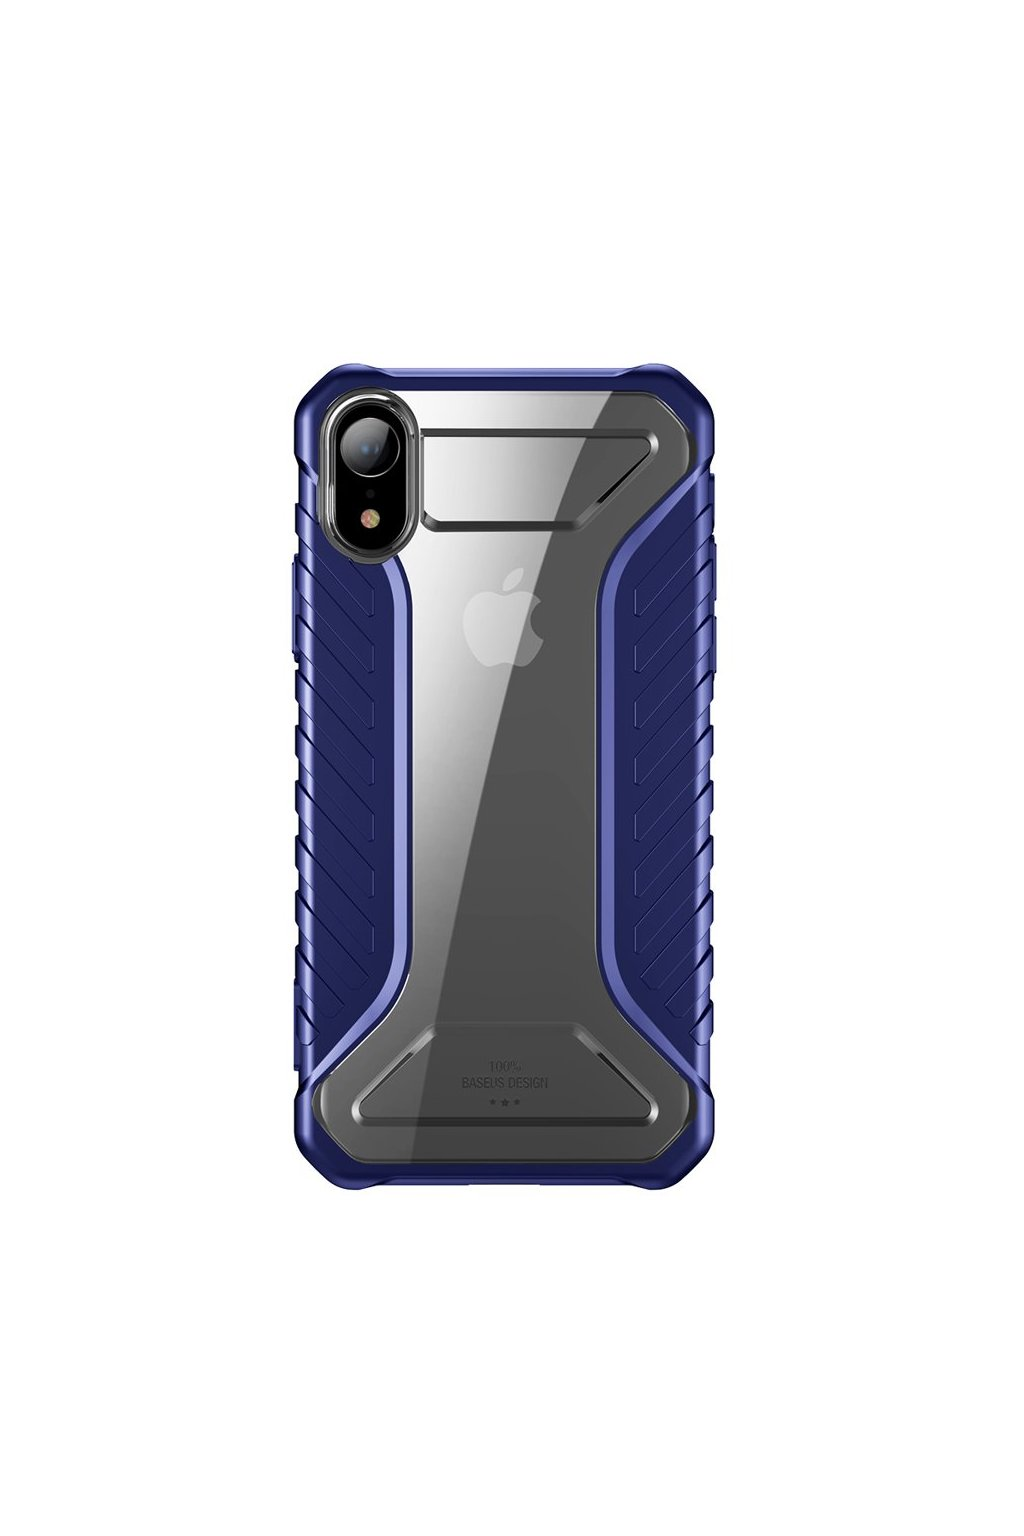 eng pl Baseus Michelin Case For iP XR 6 1inch Blue 48936 1